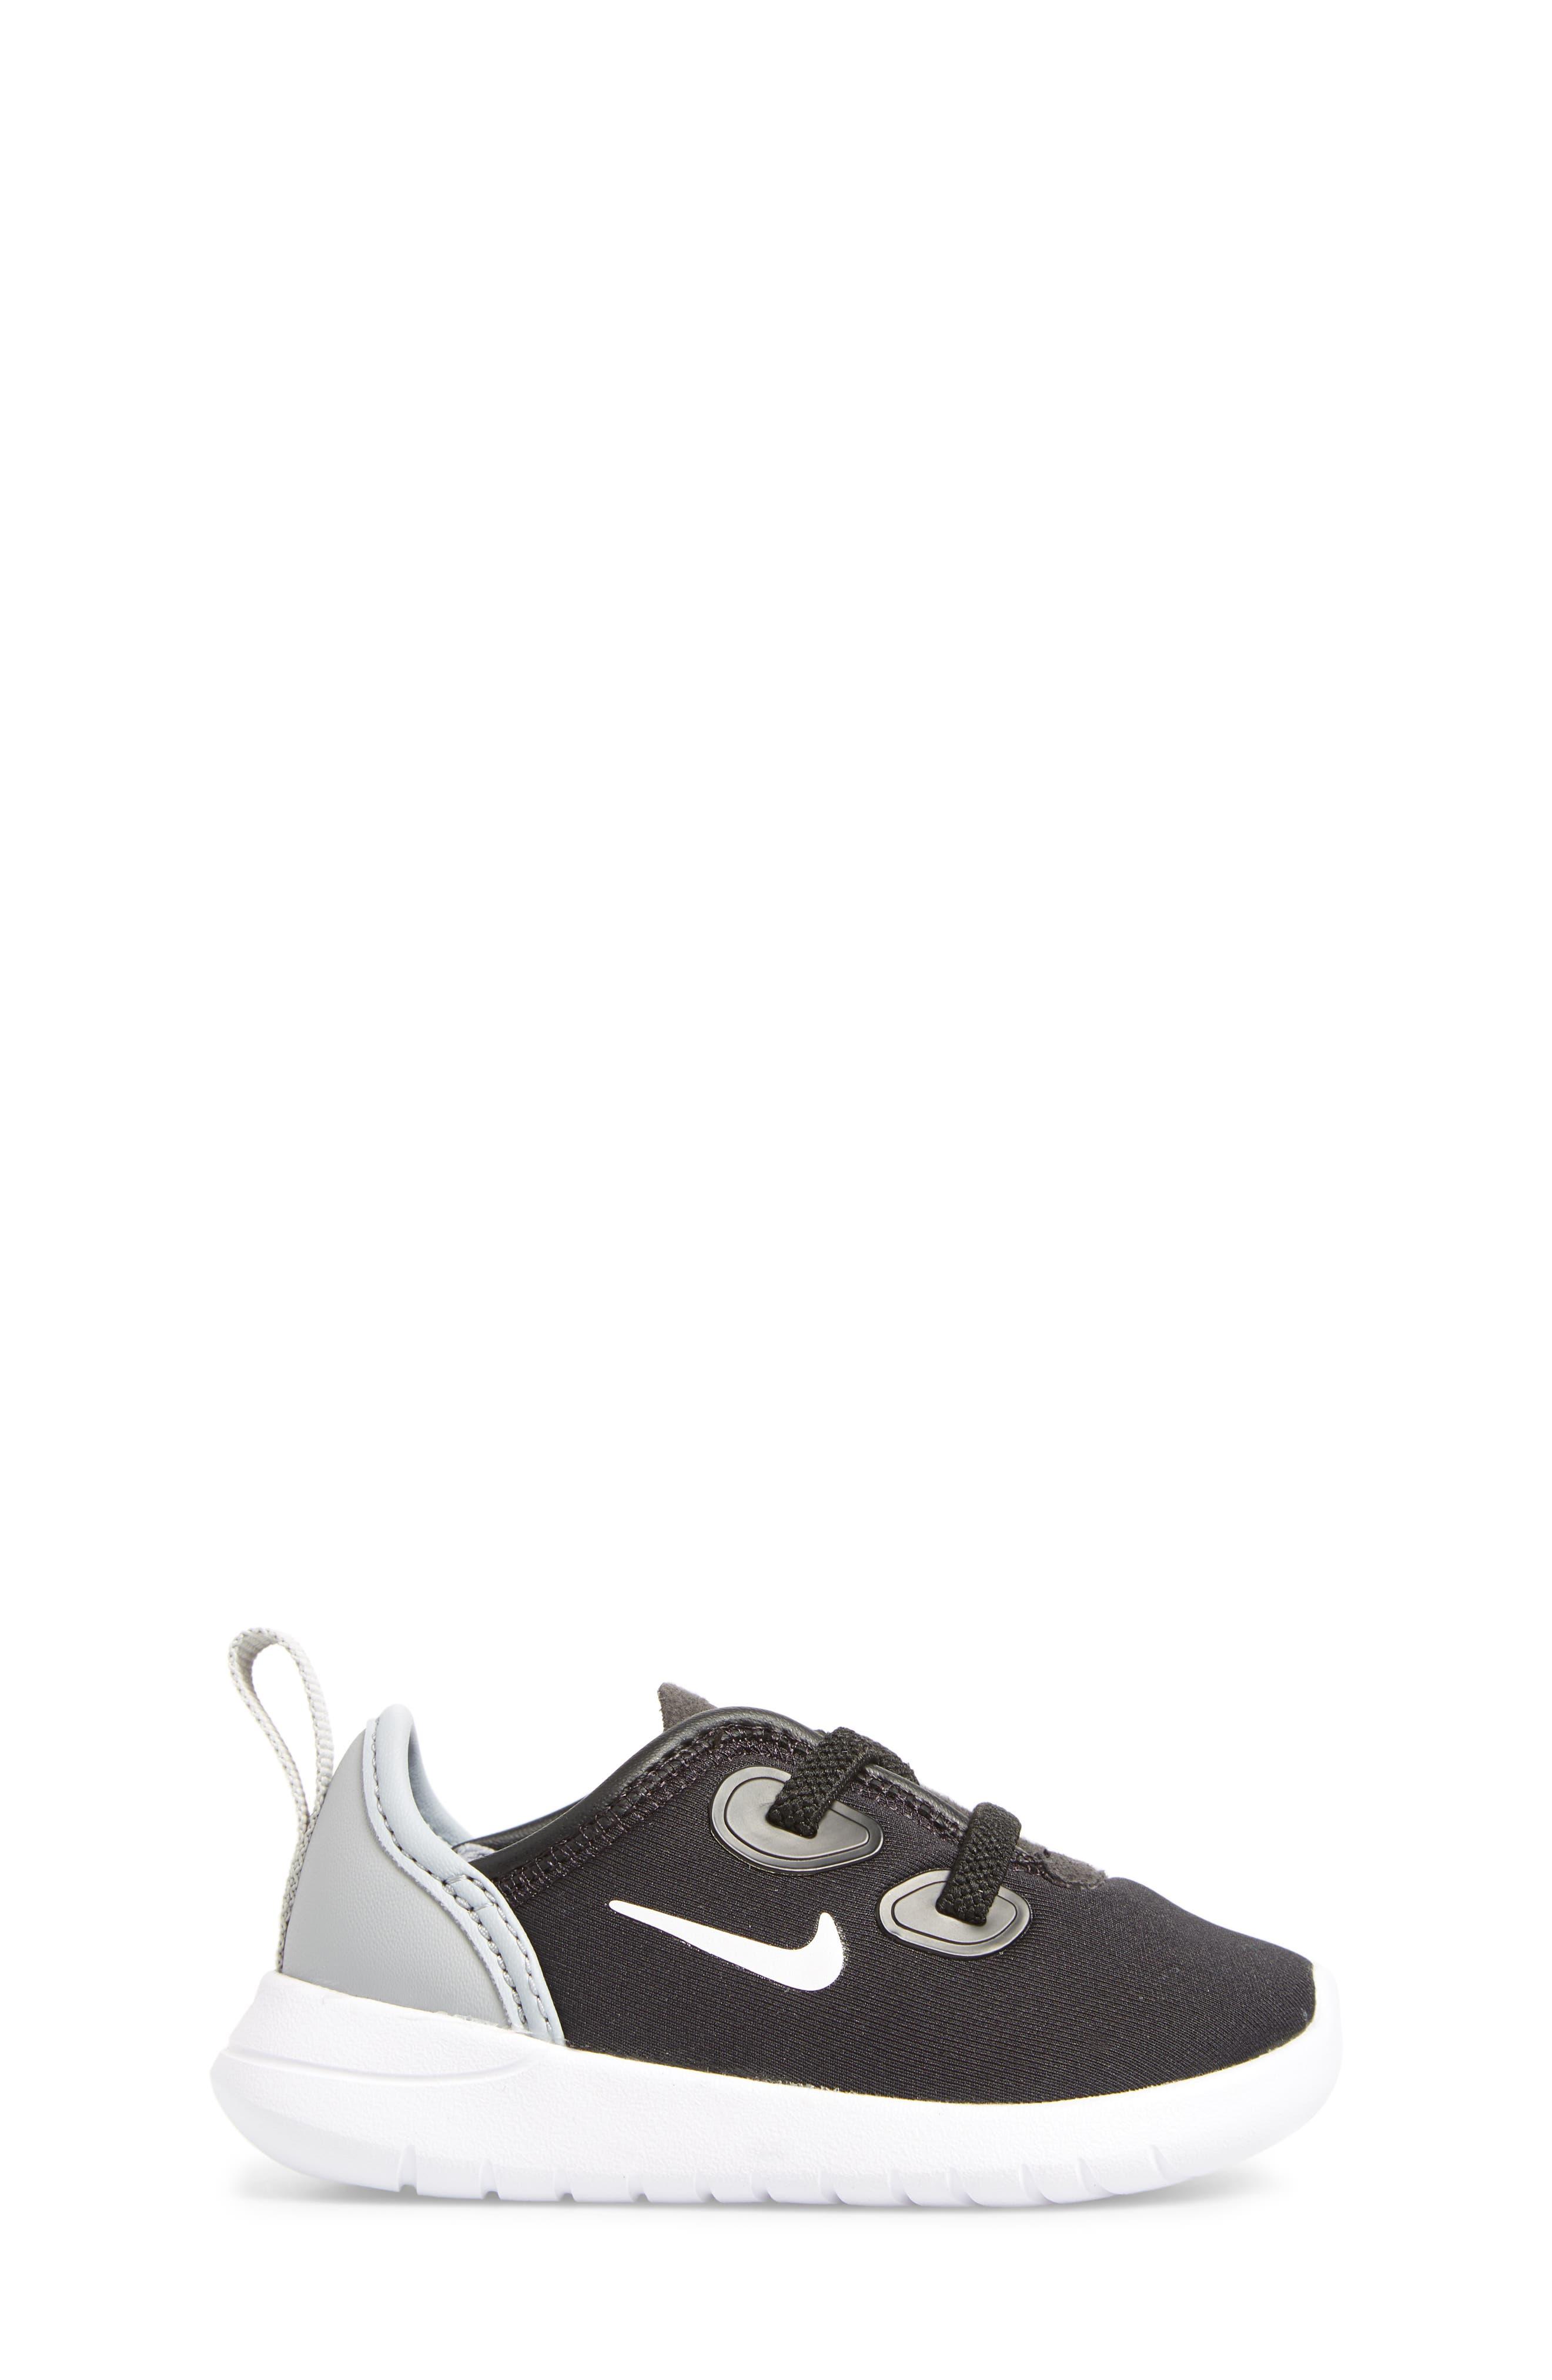 Hakata Sneaker,                             Alternate thumbnail 3, color,                             Black/ White/ Wolf Grey